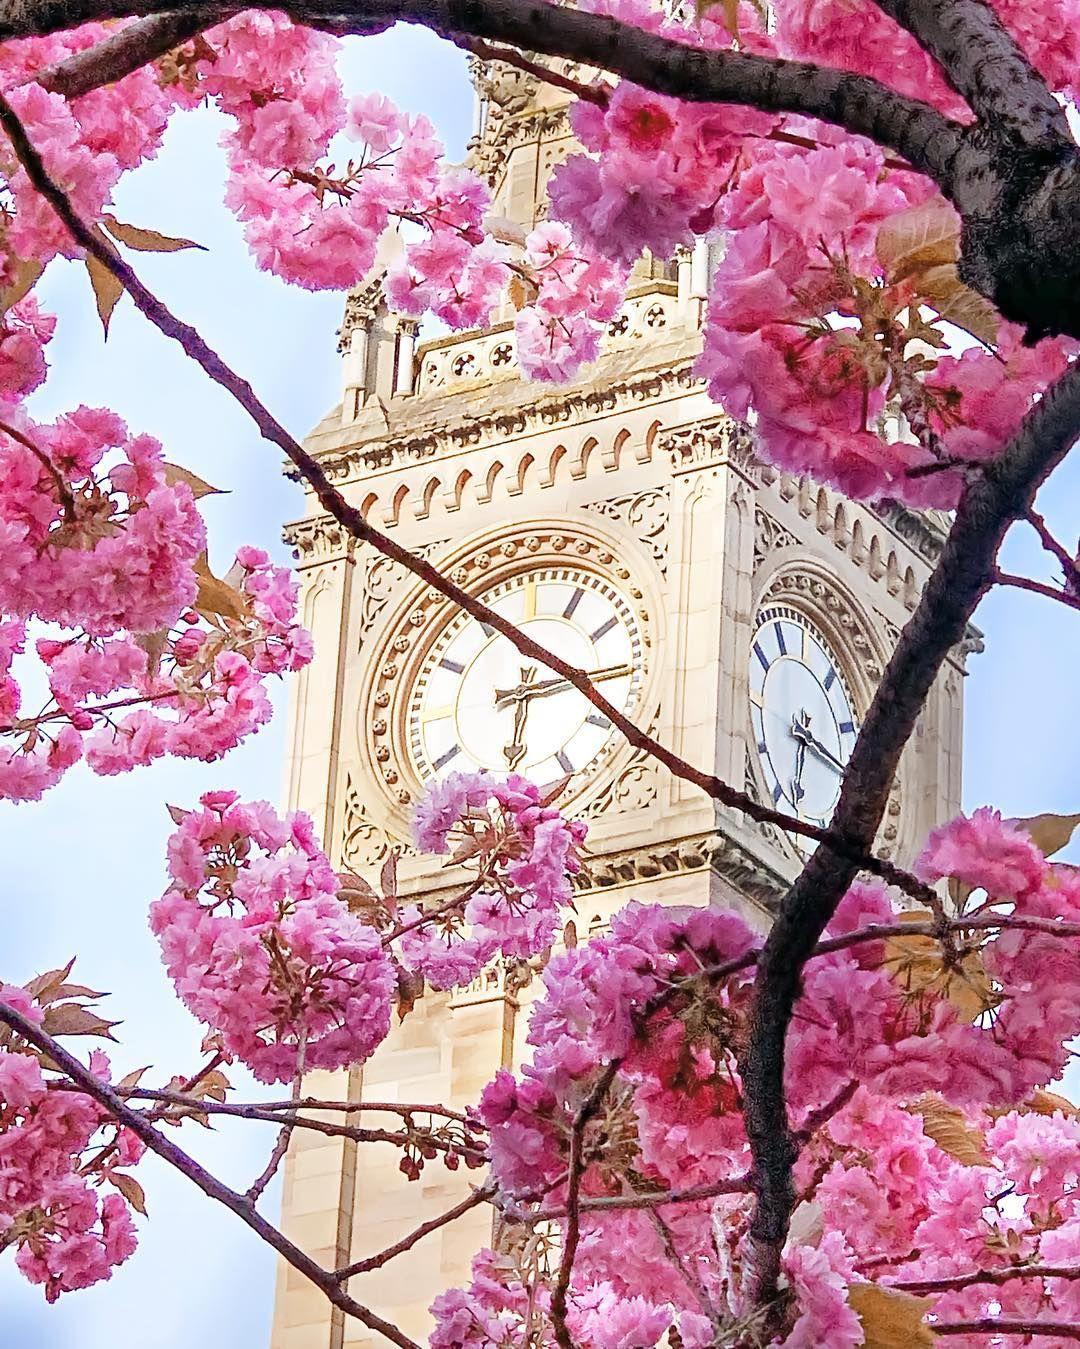 Trees In Full Bloom Near Belfast S Albert Memorial Clock Northern Ireland Uk By Nunu Sharon Cuatriz Agtawagon On Instagram Sakura Tree Sakura Bloom